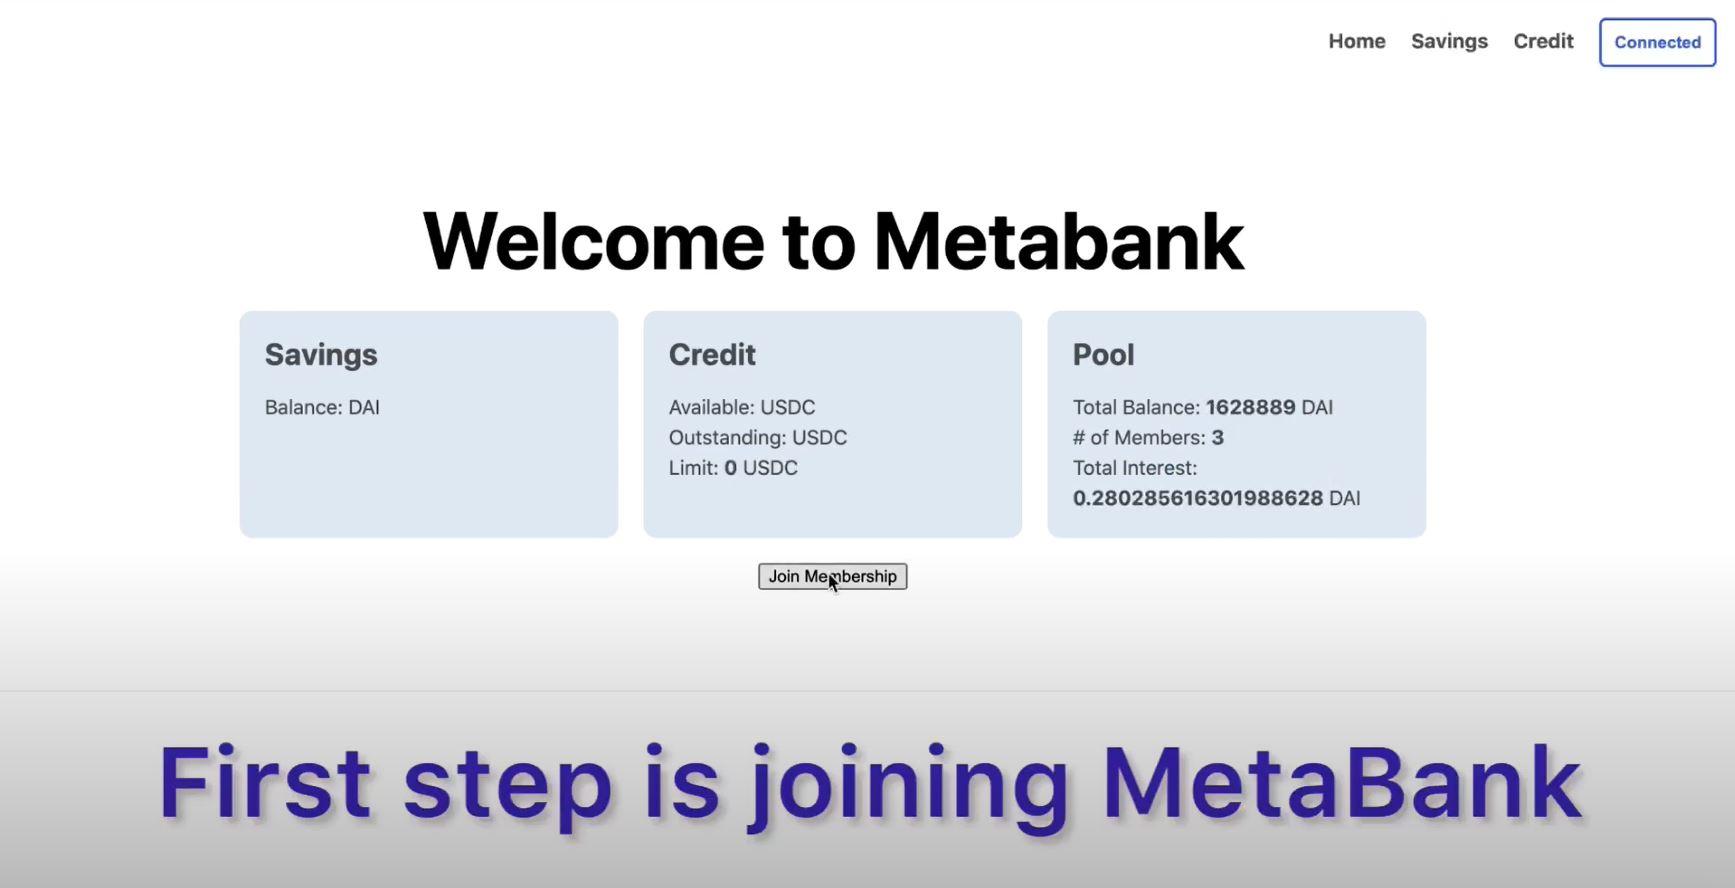 https://ethglobal.s3.amazonaws.com/recnGQk5LBb8YF4YW/metabank02.JPG